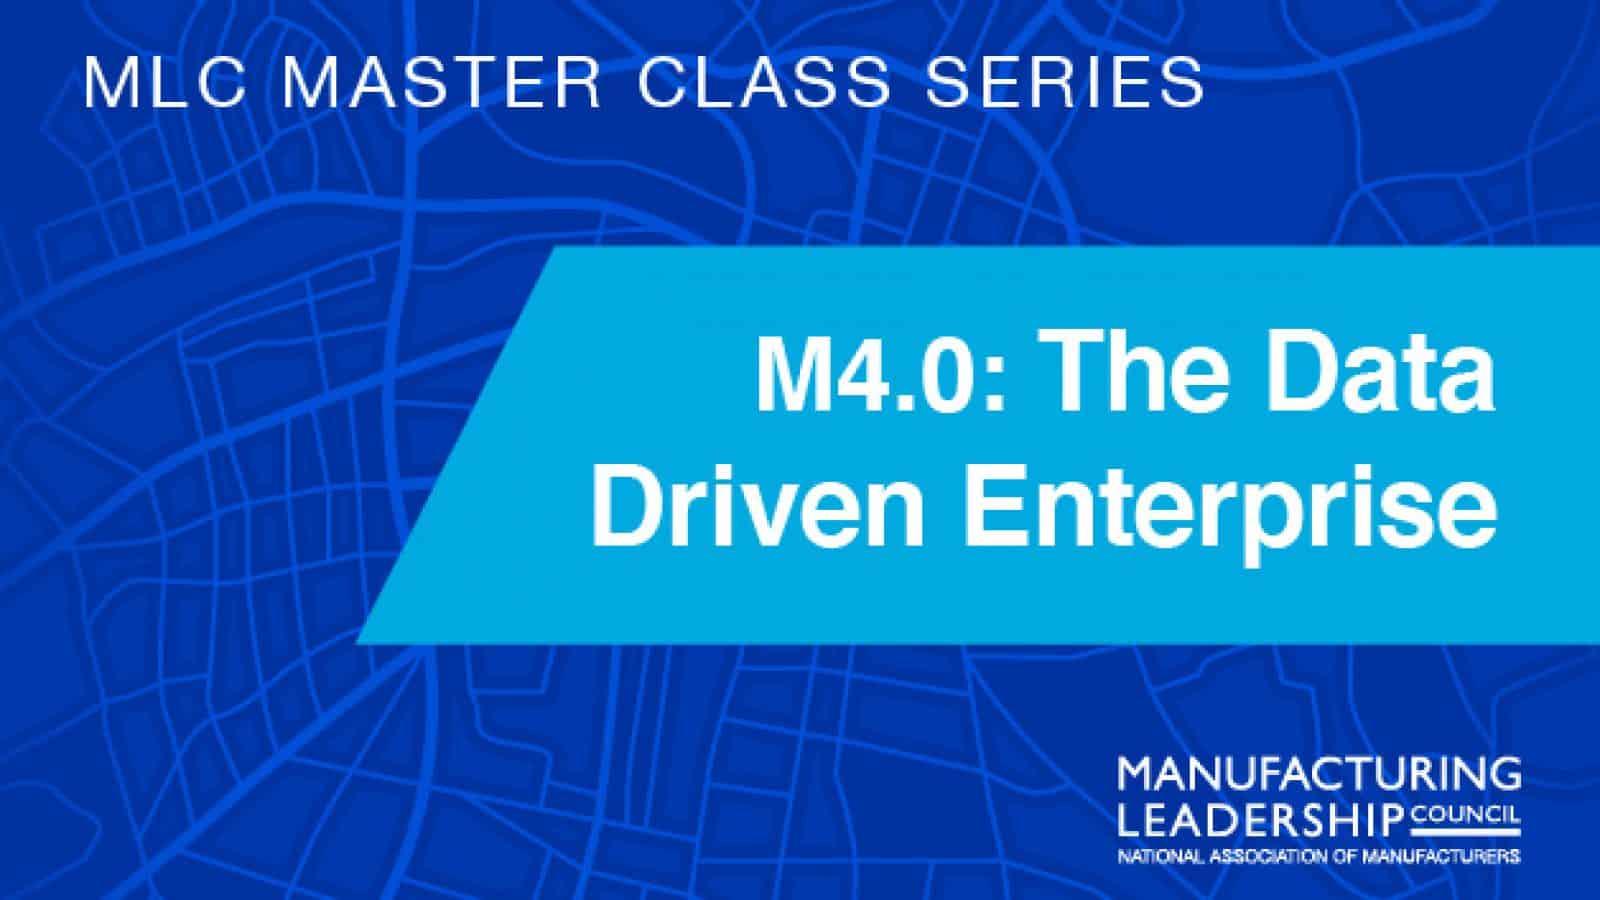 M4.0: The Data Driven Enterprise